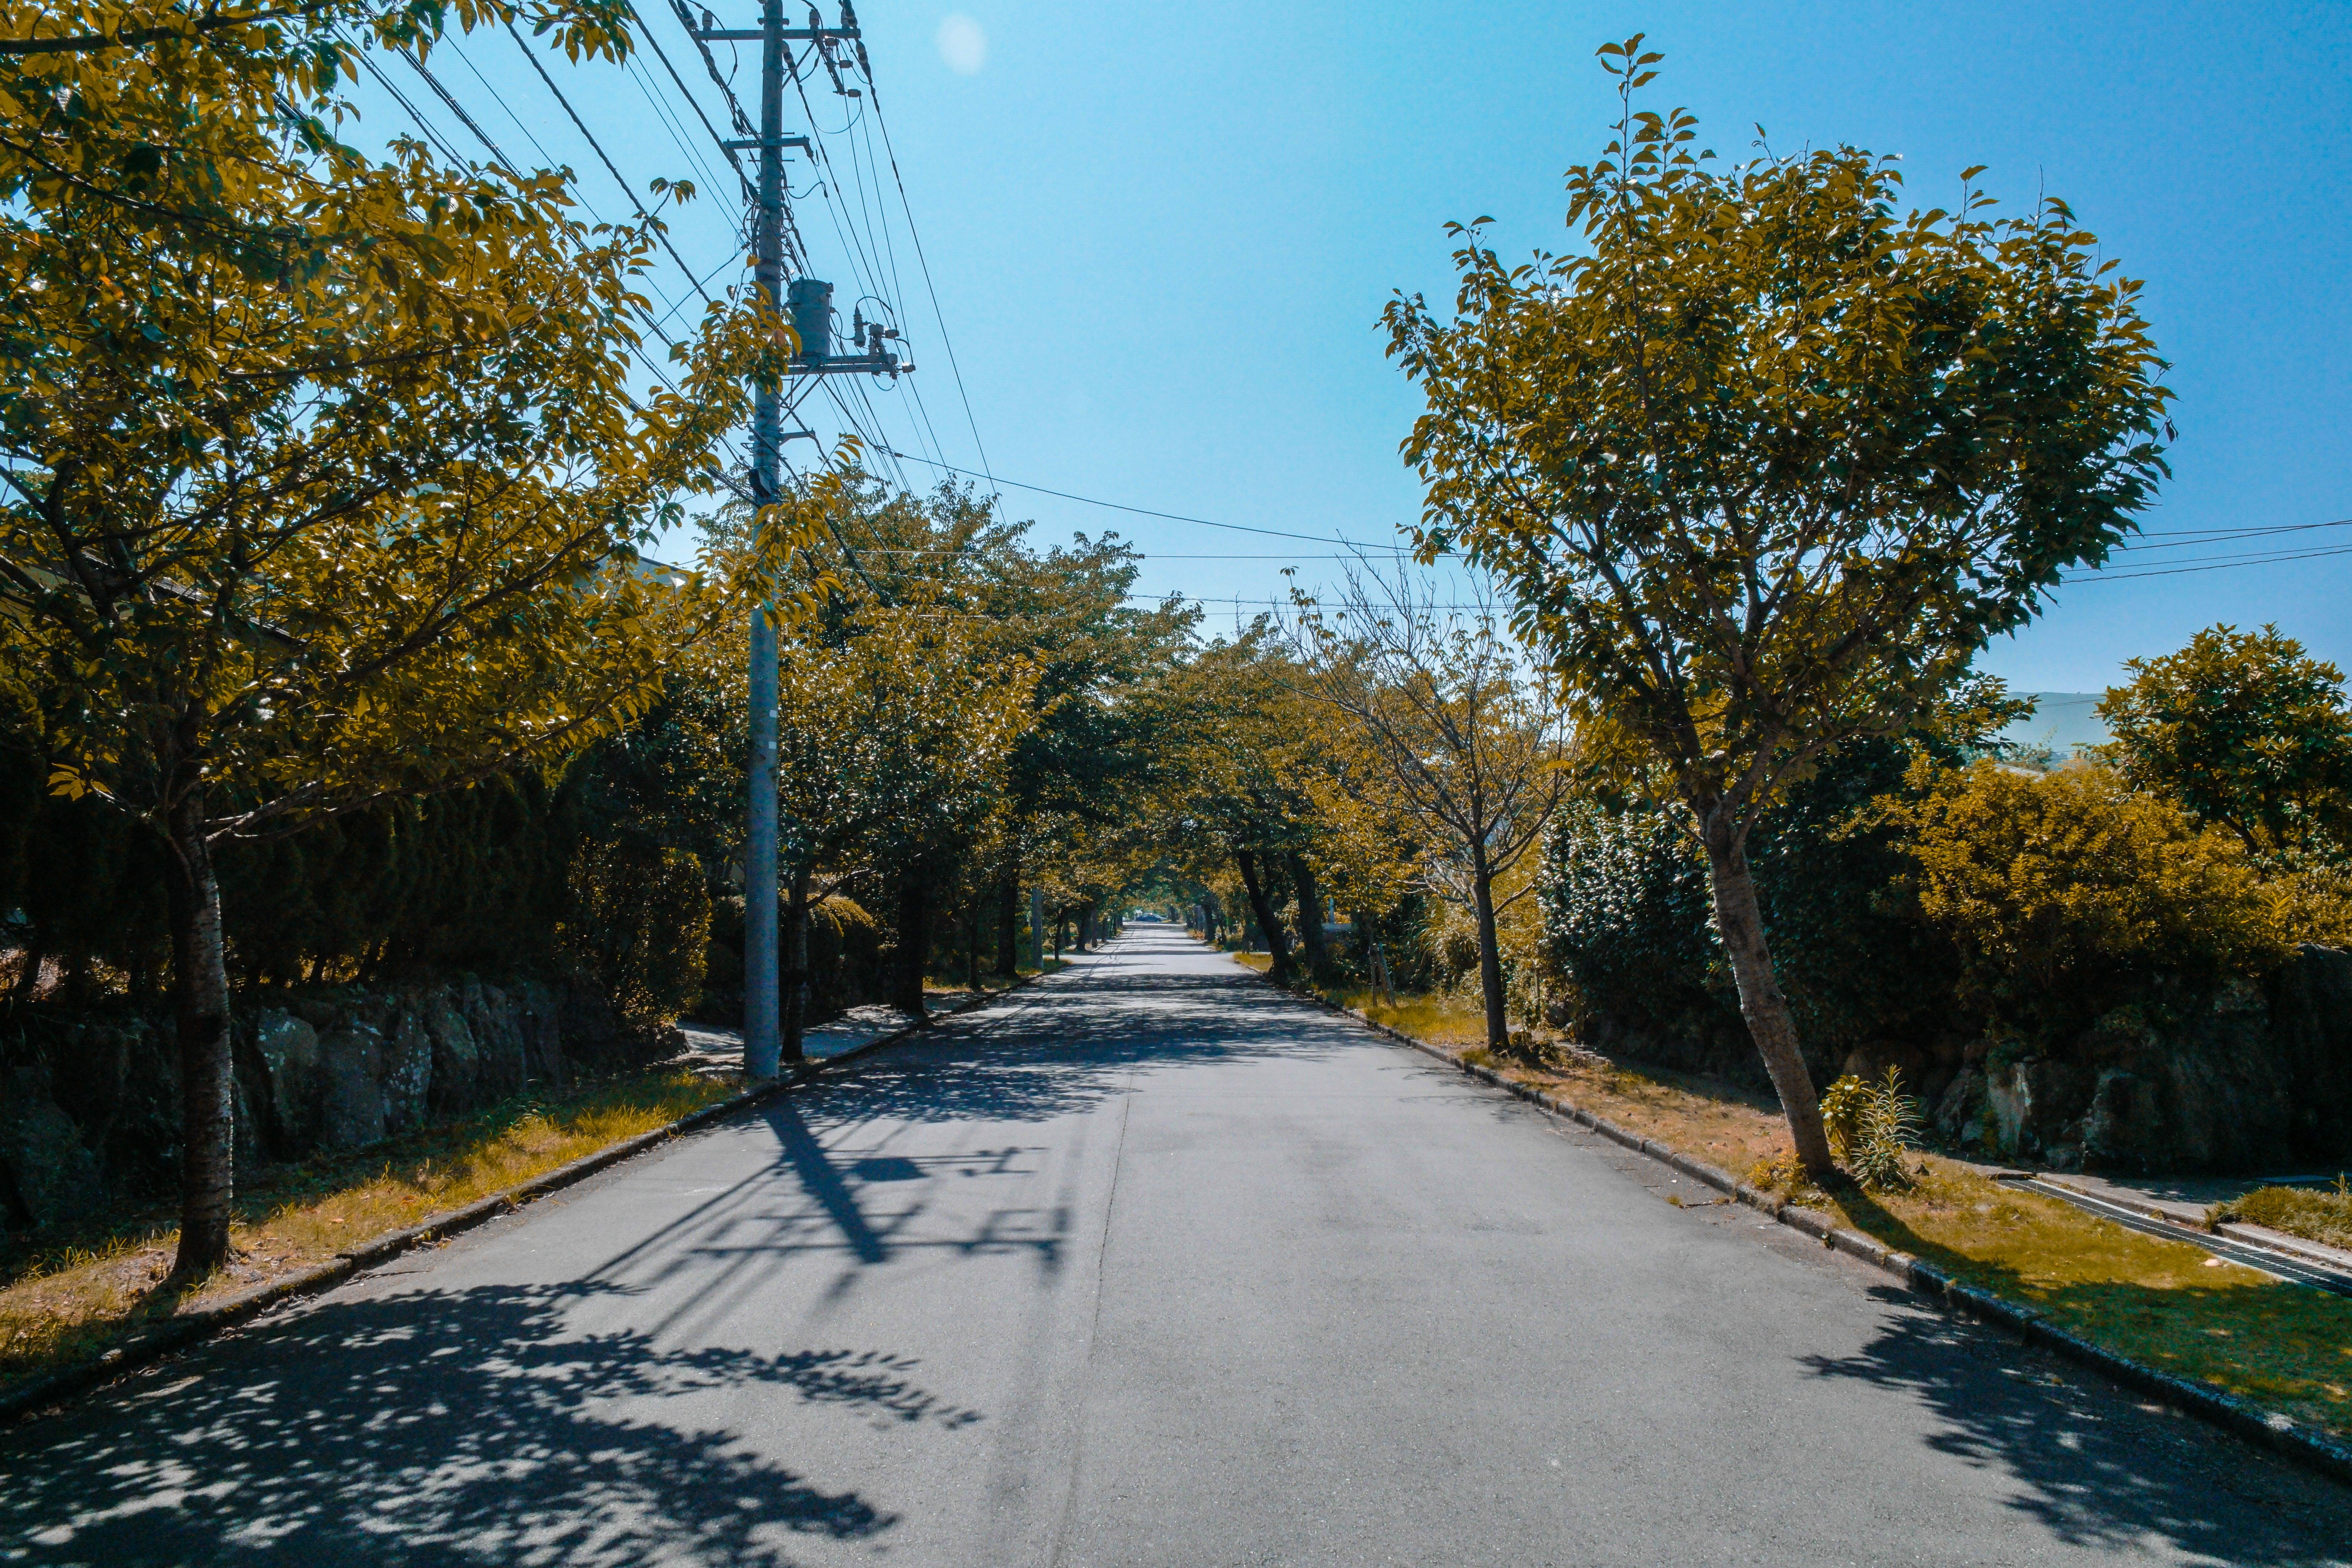 Free stock photo of road, street, trees, empty